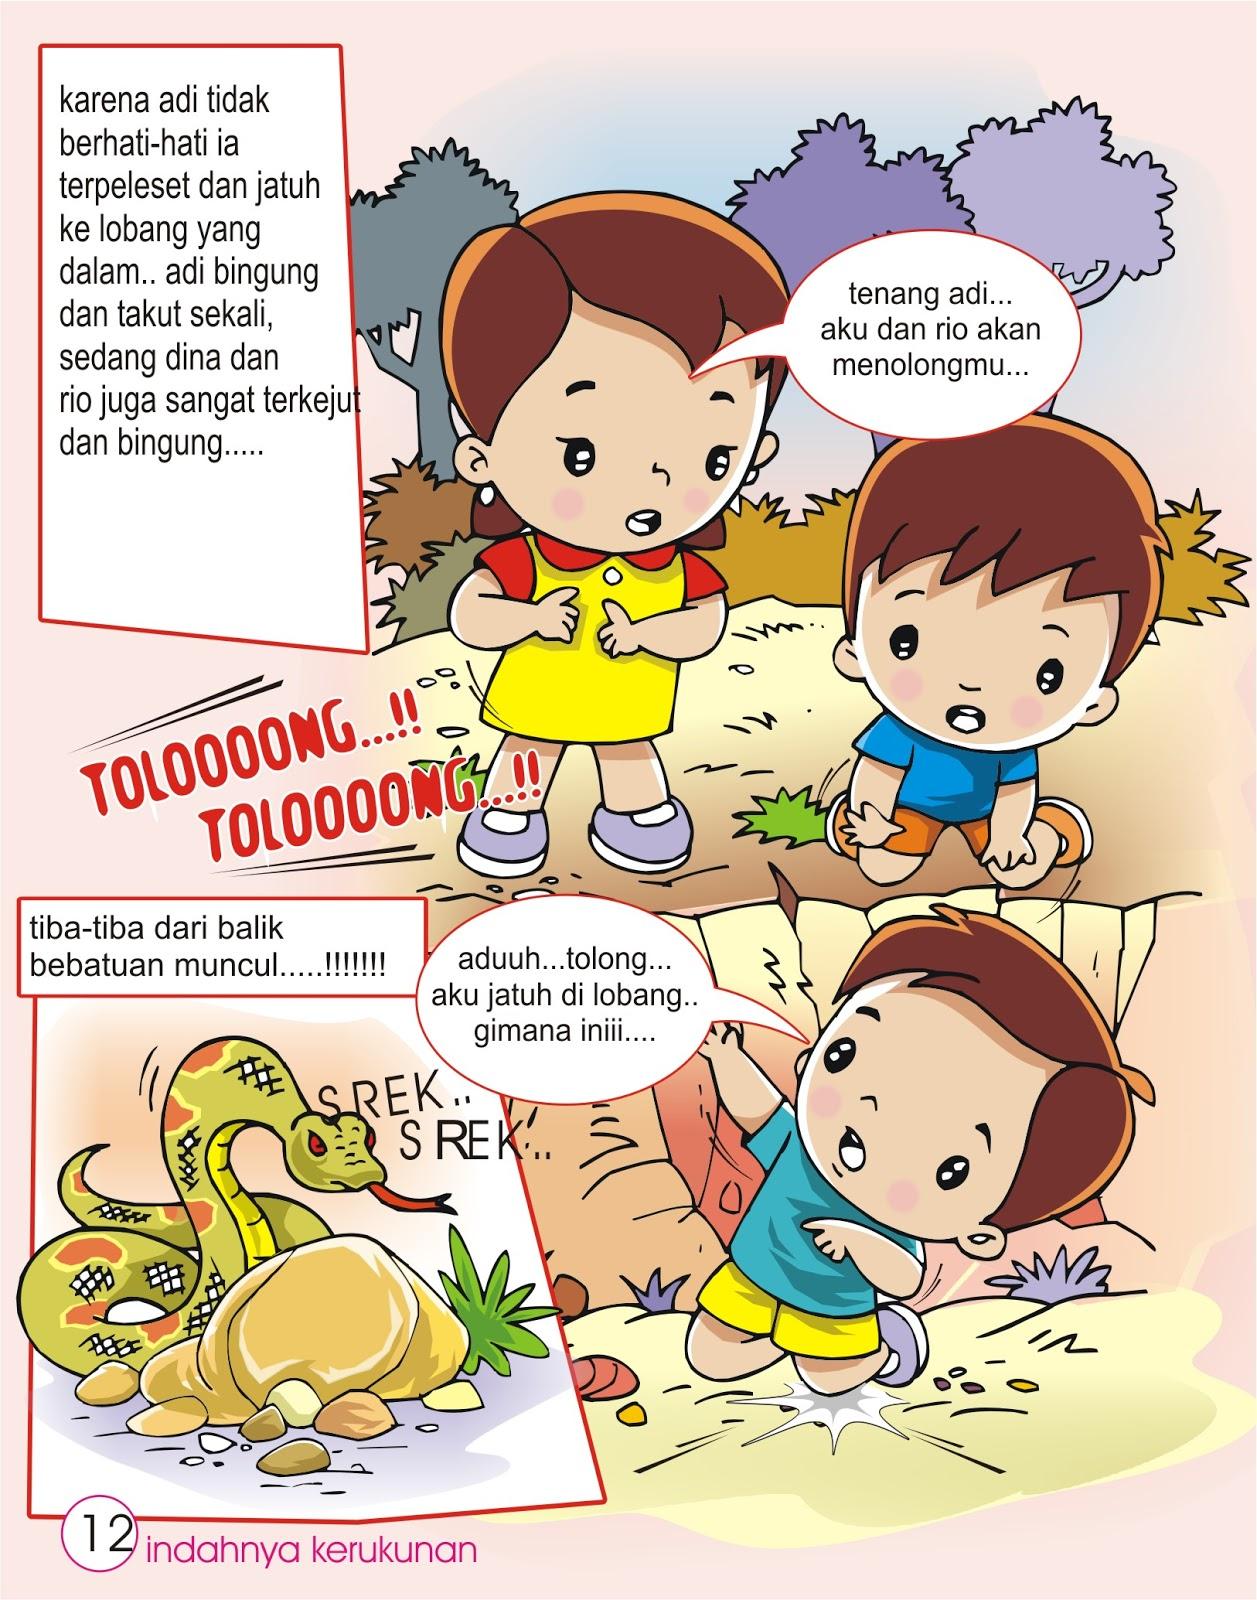 cegam anak anak contoh cerita bergambar untuk anak anak